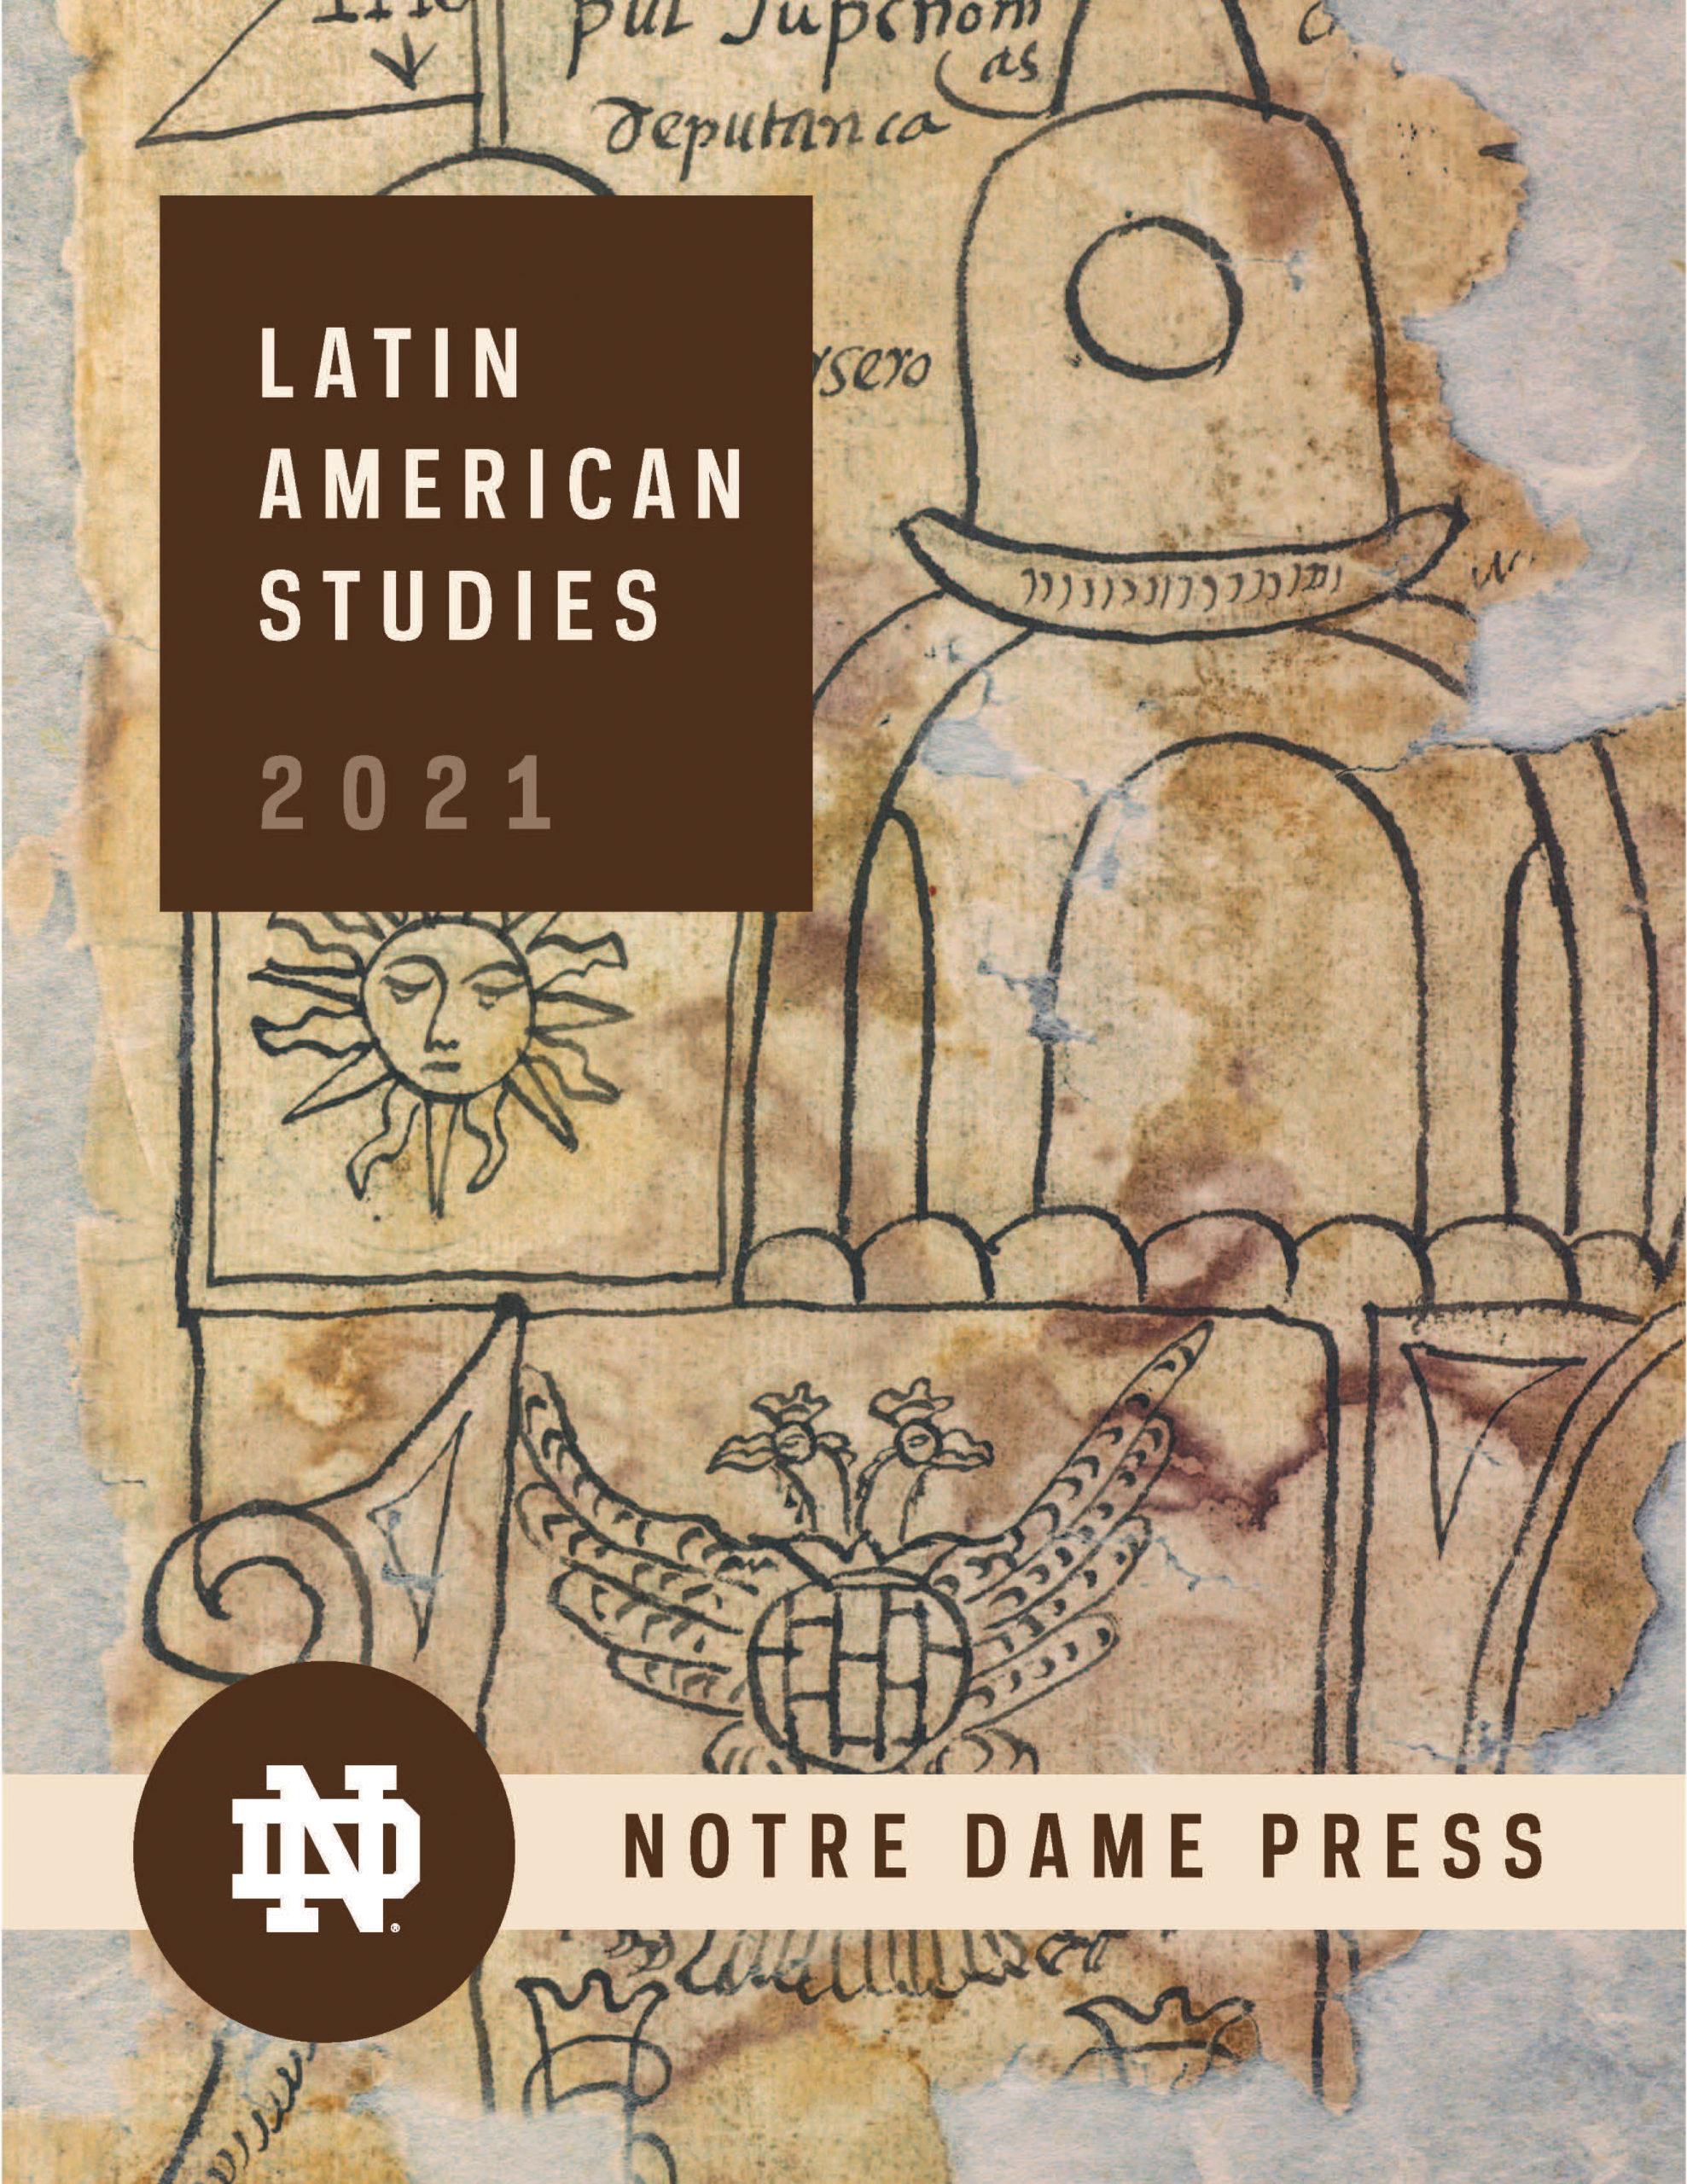 Latin American Studies 2021